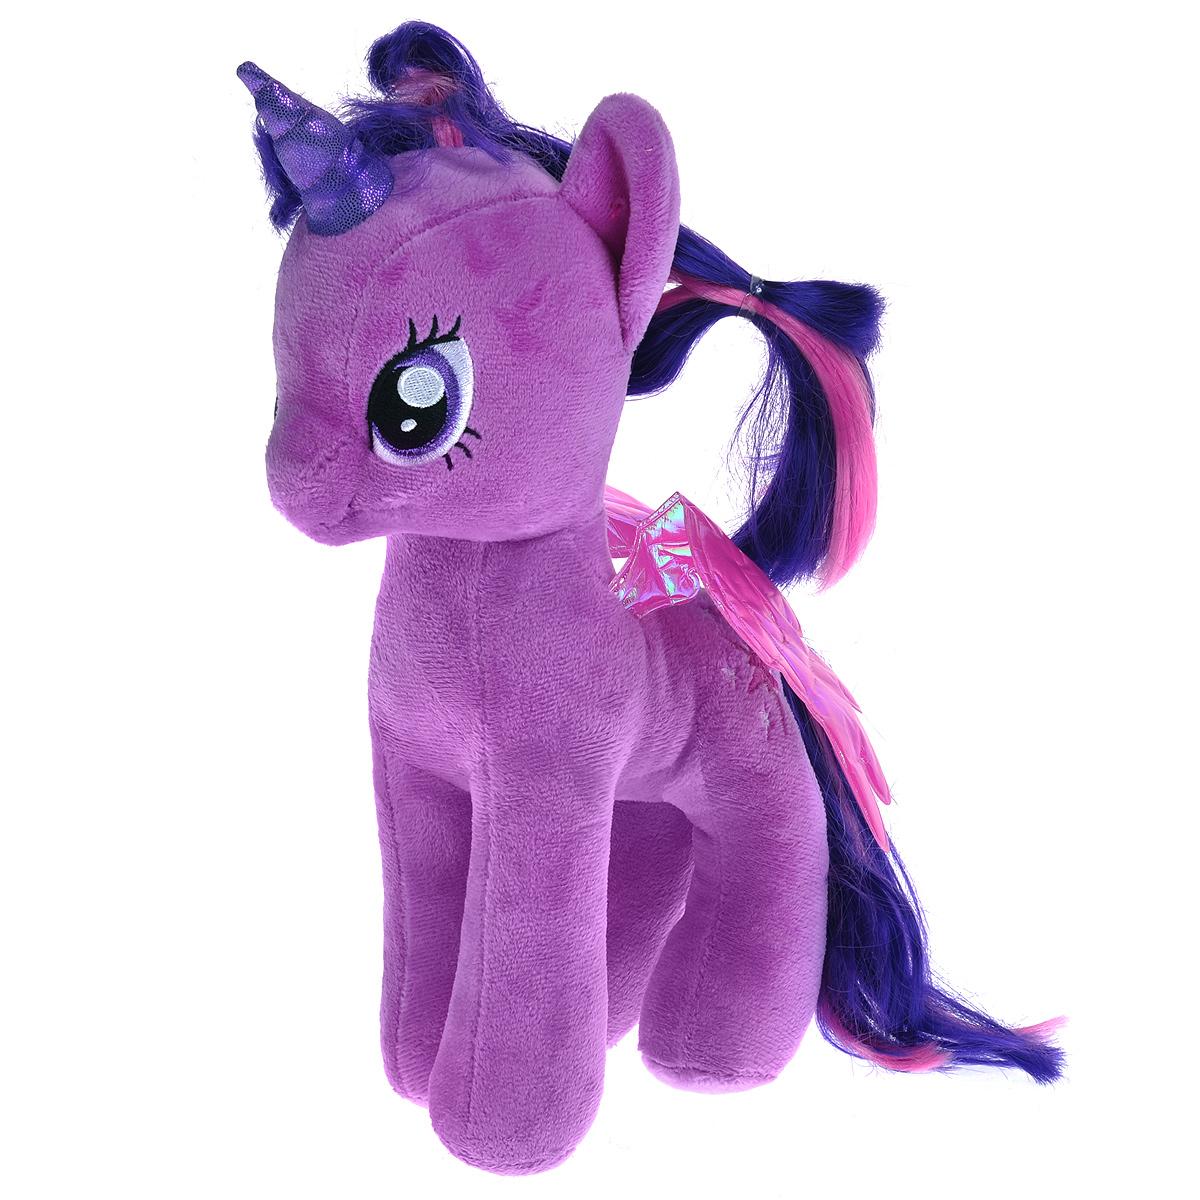 My Little Pony. Пони Twilight Sparkle, 29 см мульти пульти мягкая игрушка принцесса луна 18 см со звуком my little pony мульти пульти